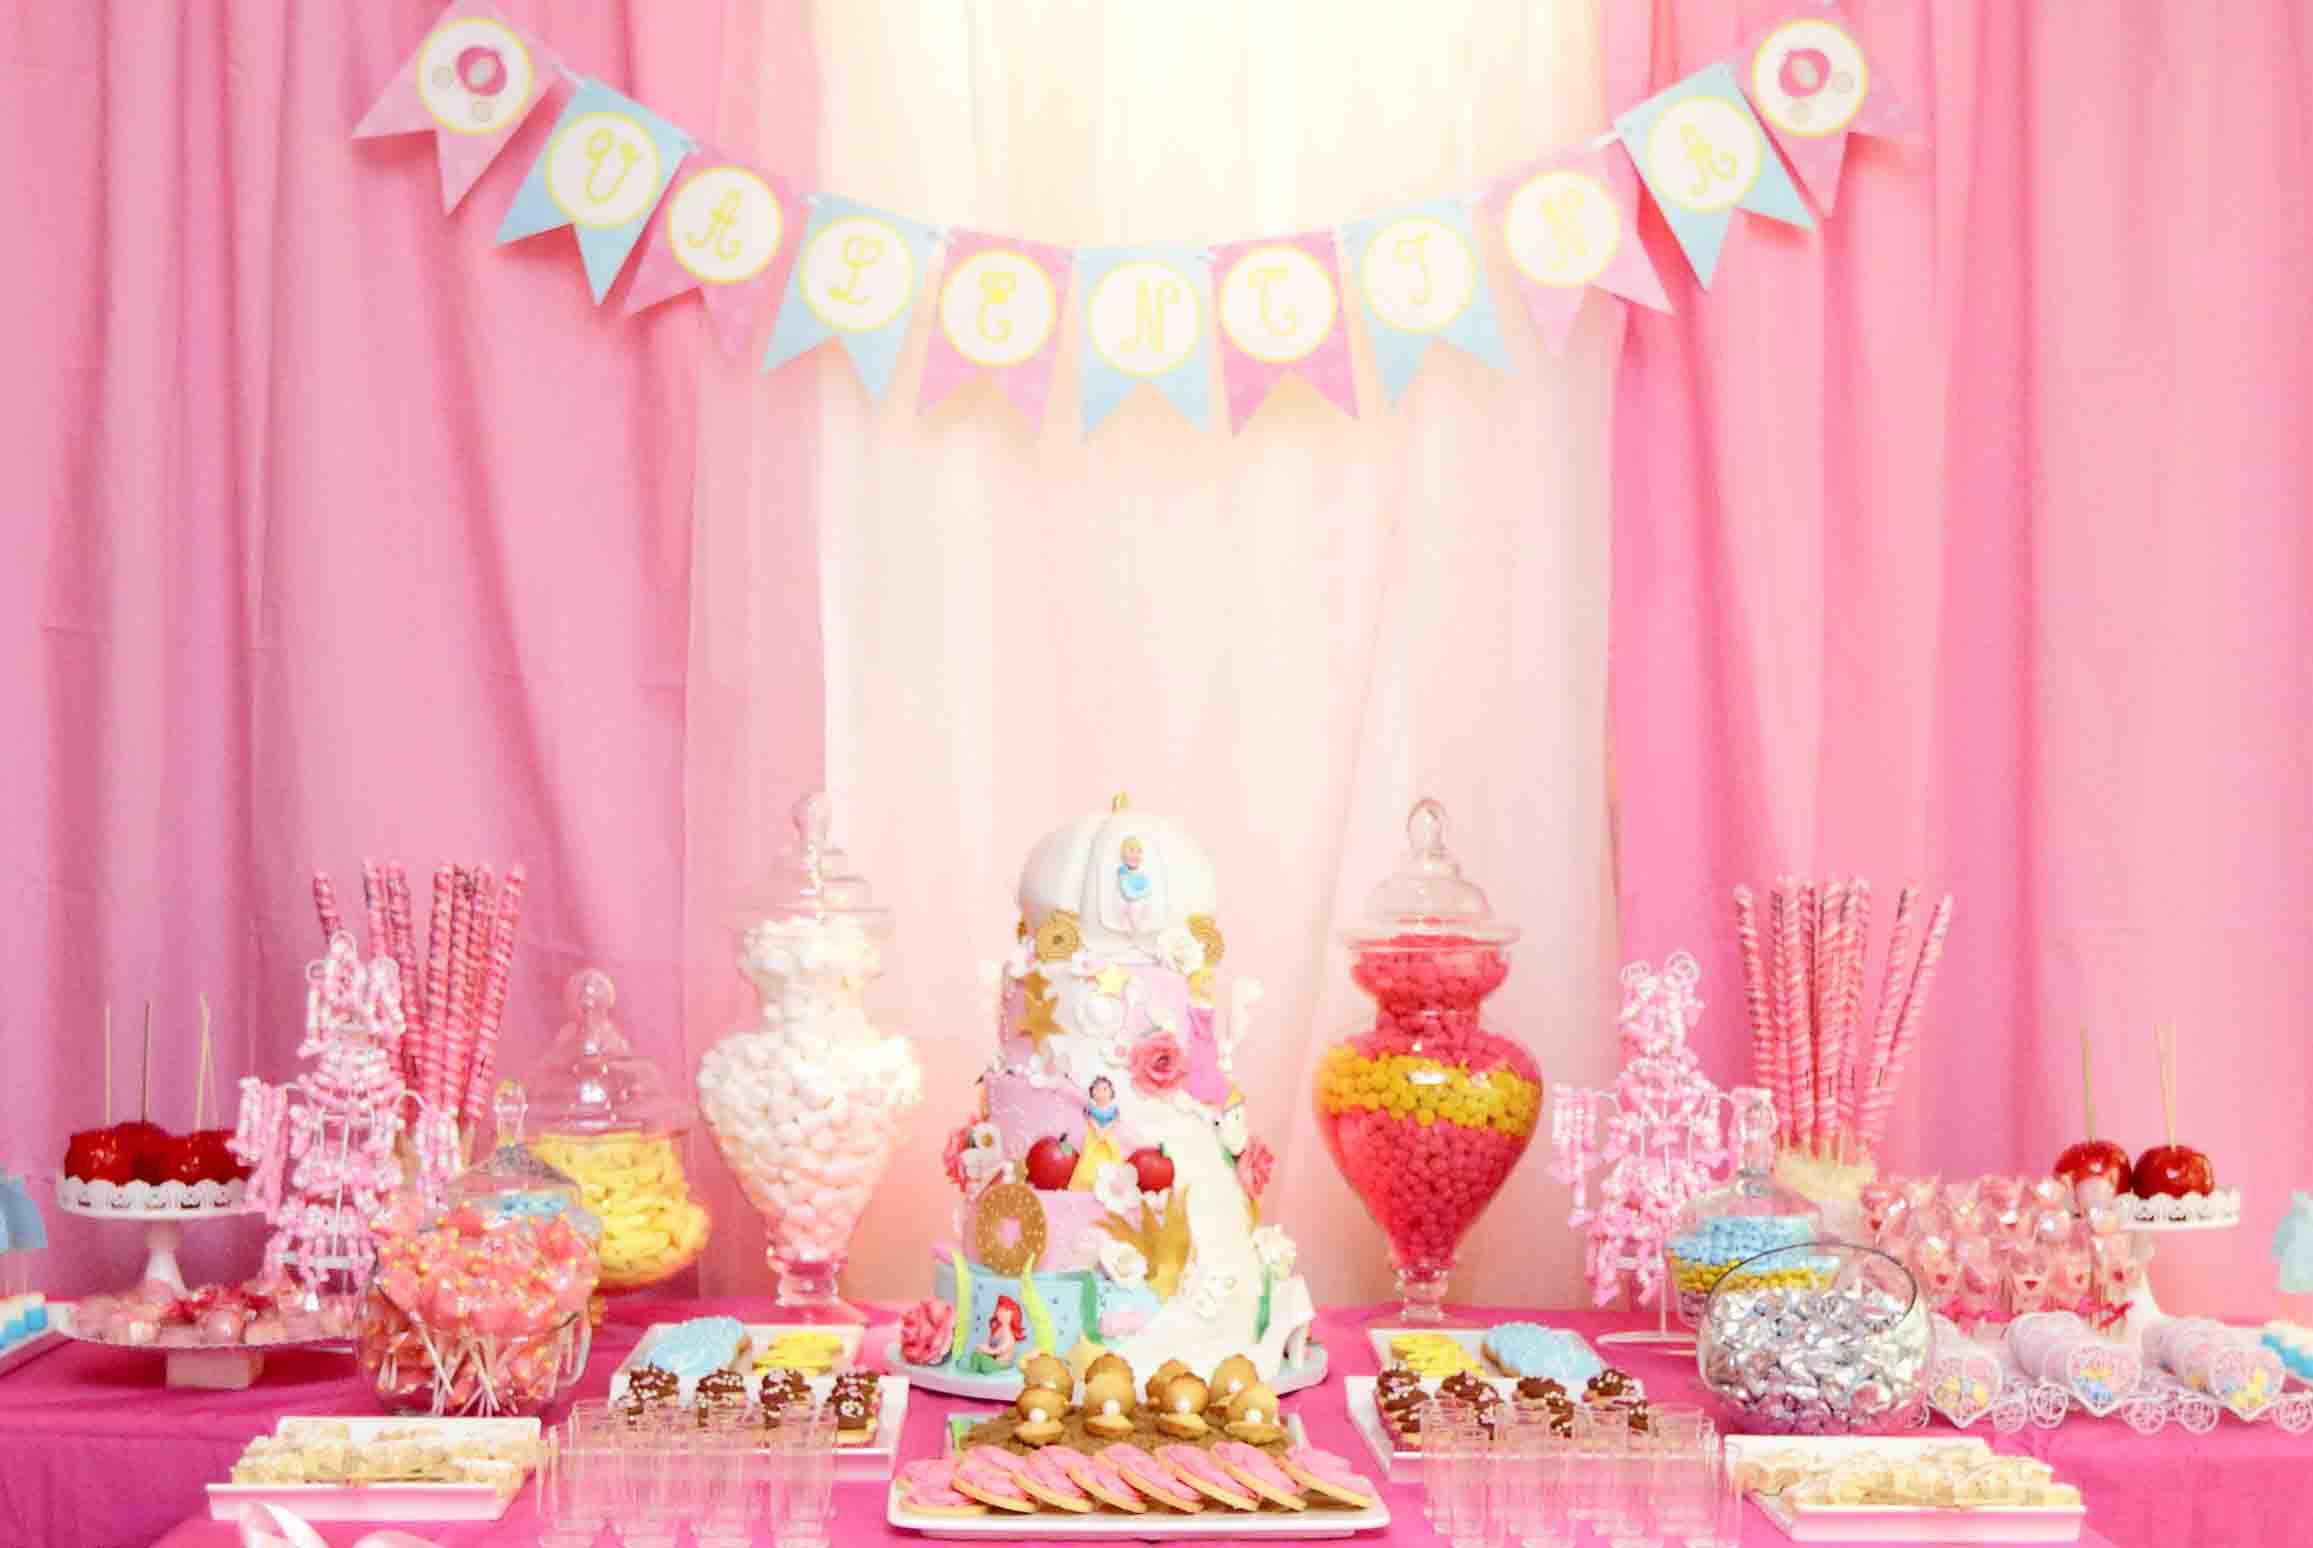 7 Creative DIY Ideas for Birthday Parties DIYVila